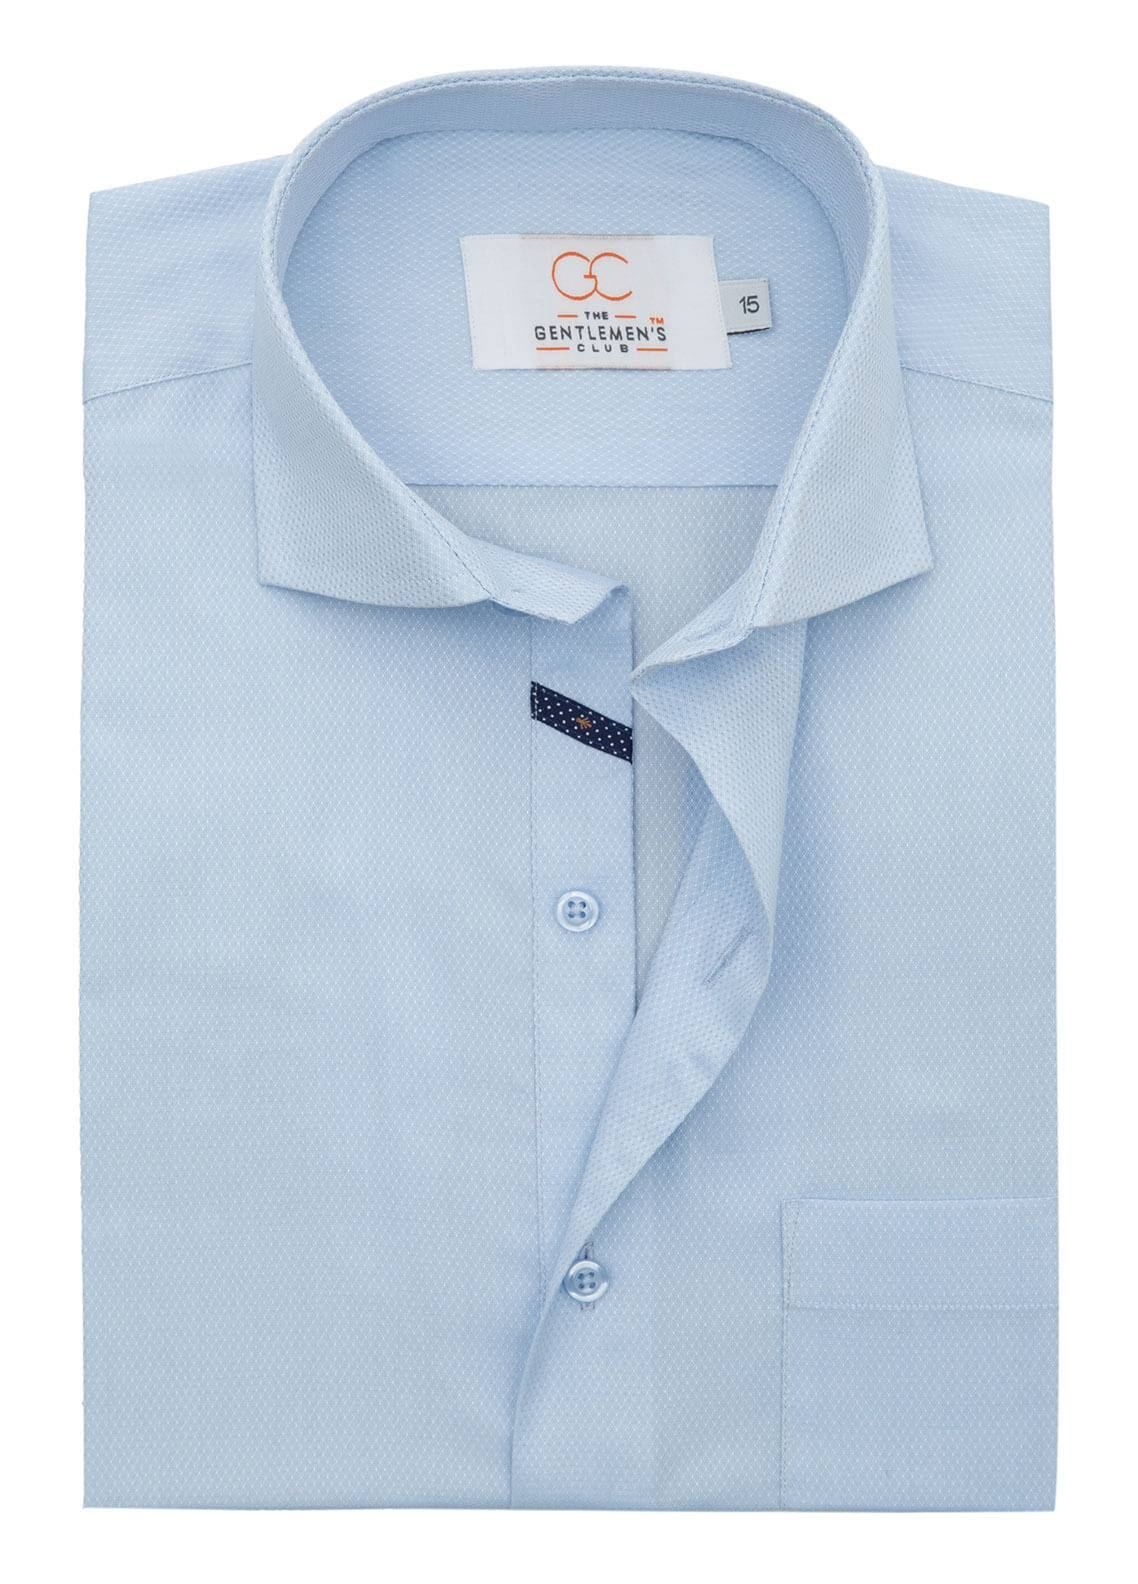 The Gentlemen's Club Cotton Formal Men Shirts - Sky Blue White Label 4084 - 17.5